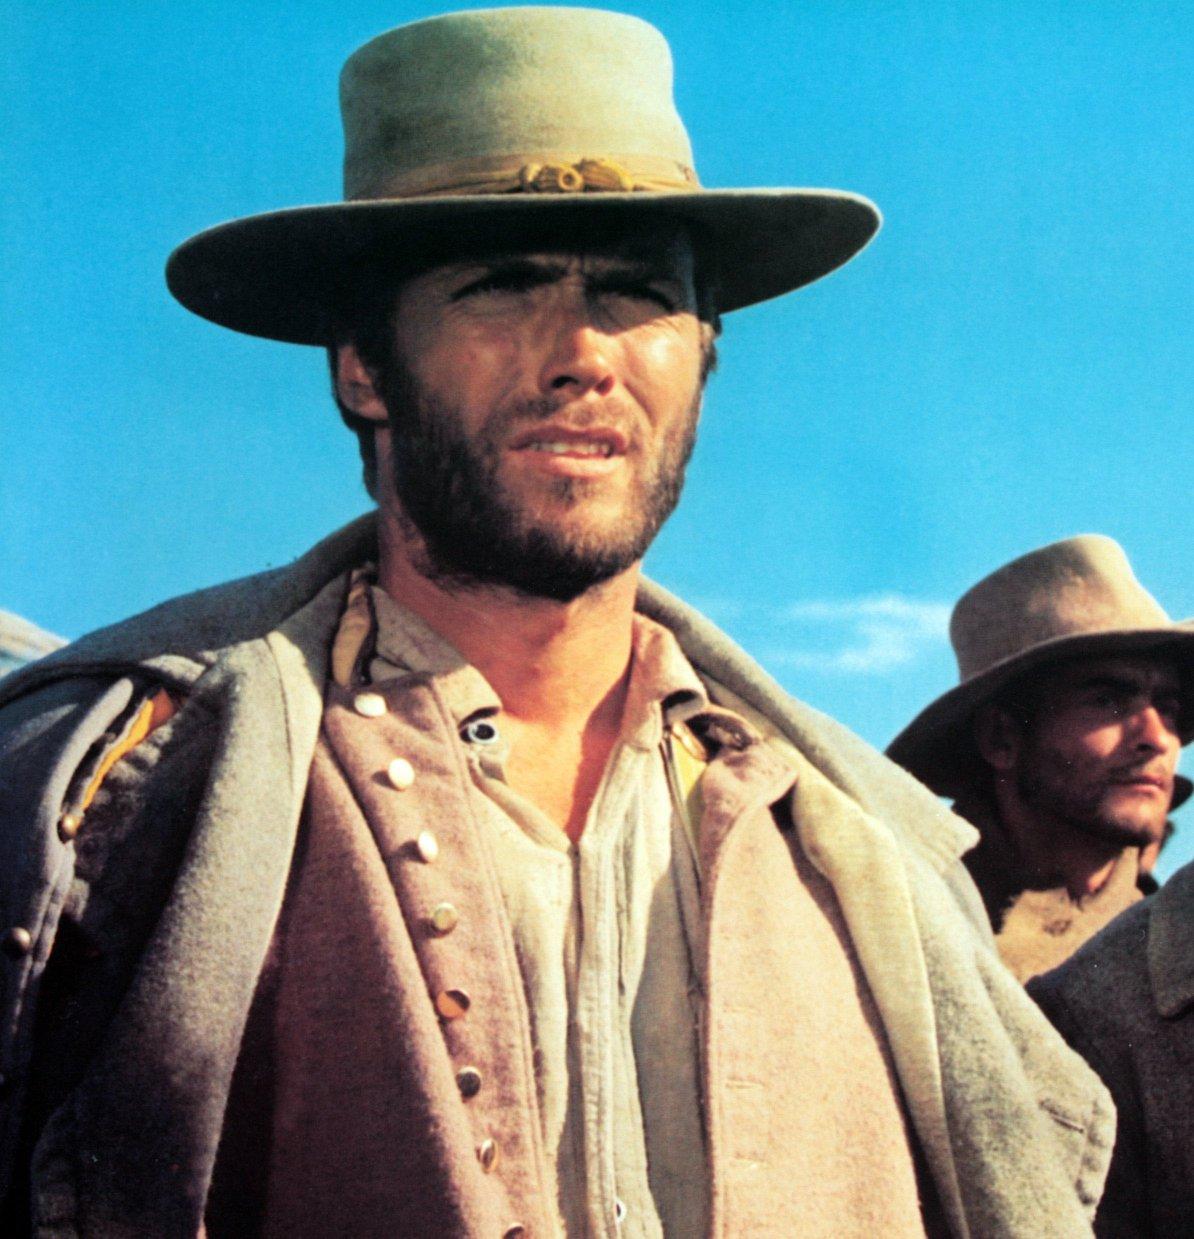 Buon compleanno Clint Eastwood, due giorni su Sky Cinema ded